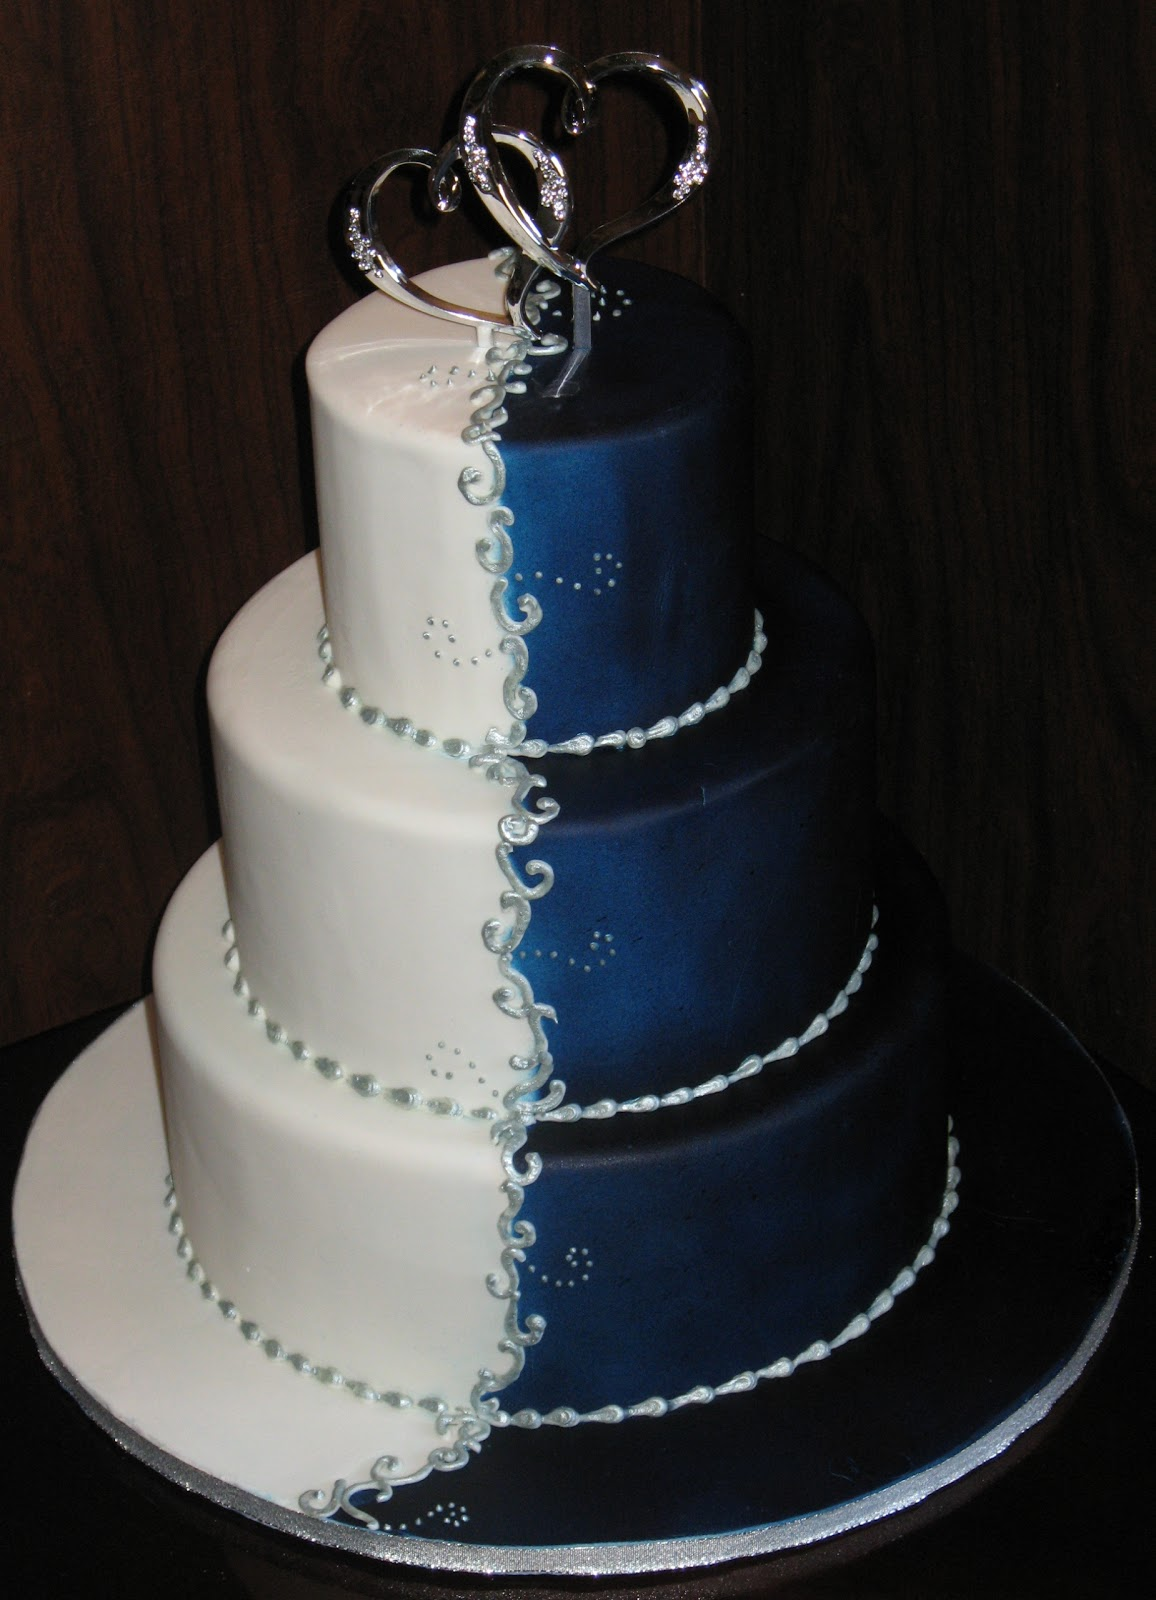 Navy Blue Cake Images : Pin Navy Blue Wedding Cake Cake on Pinterest